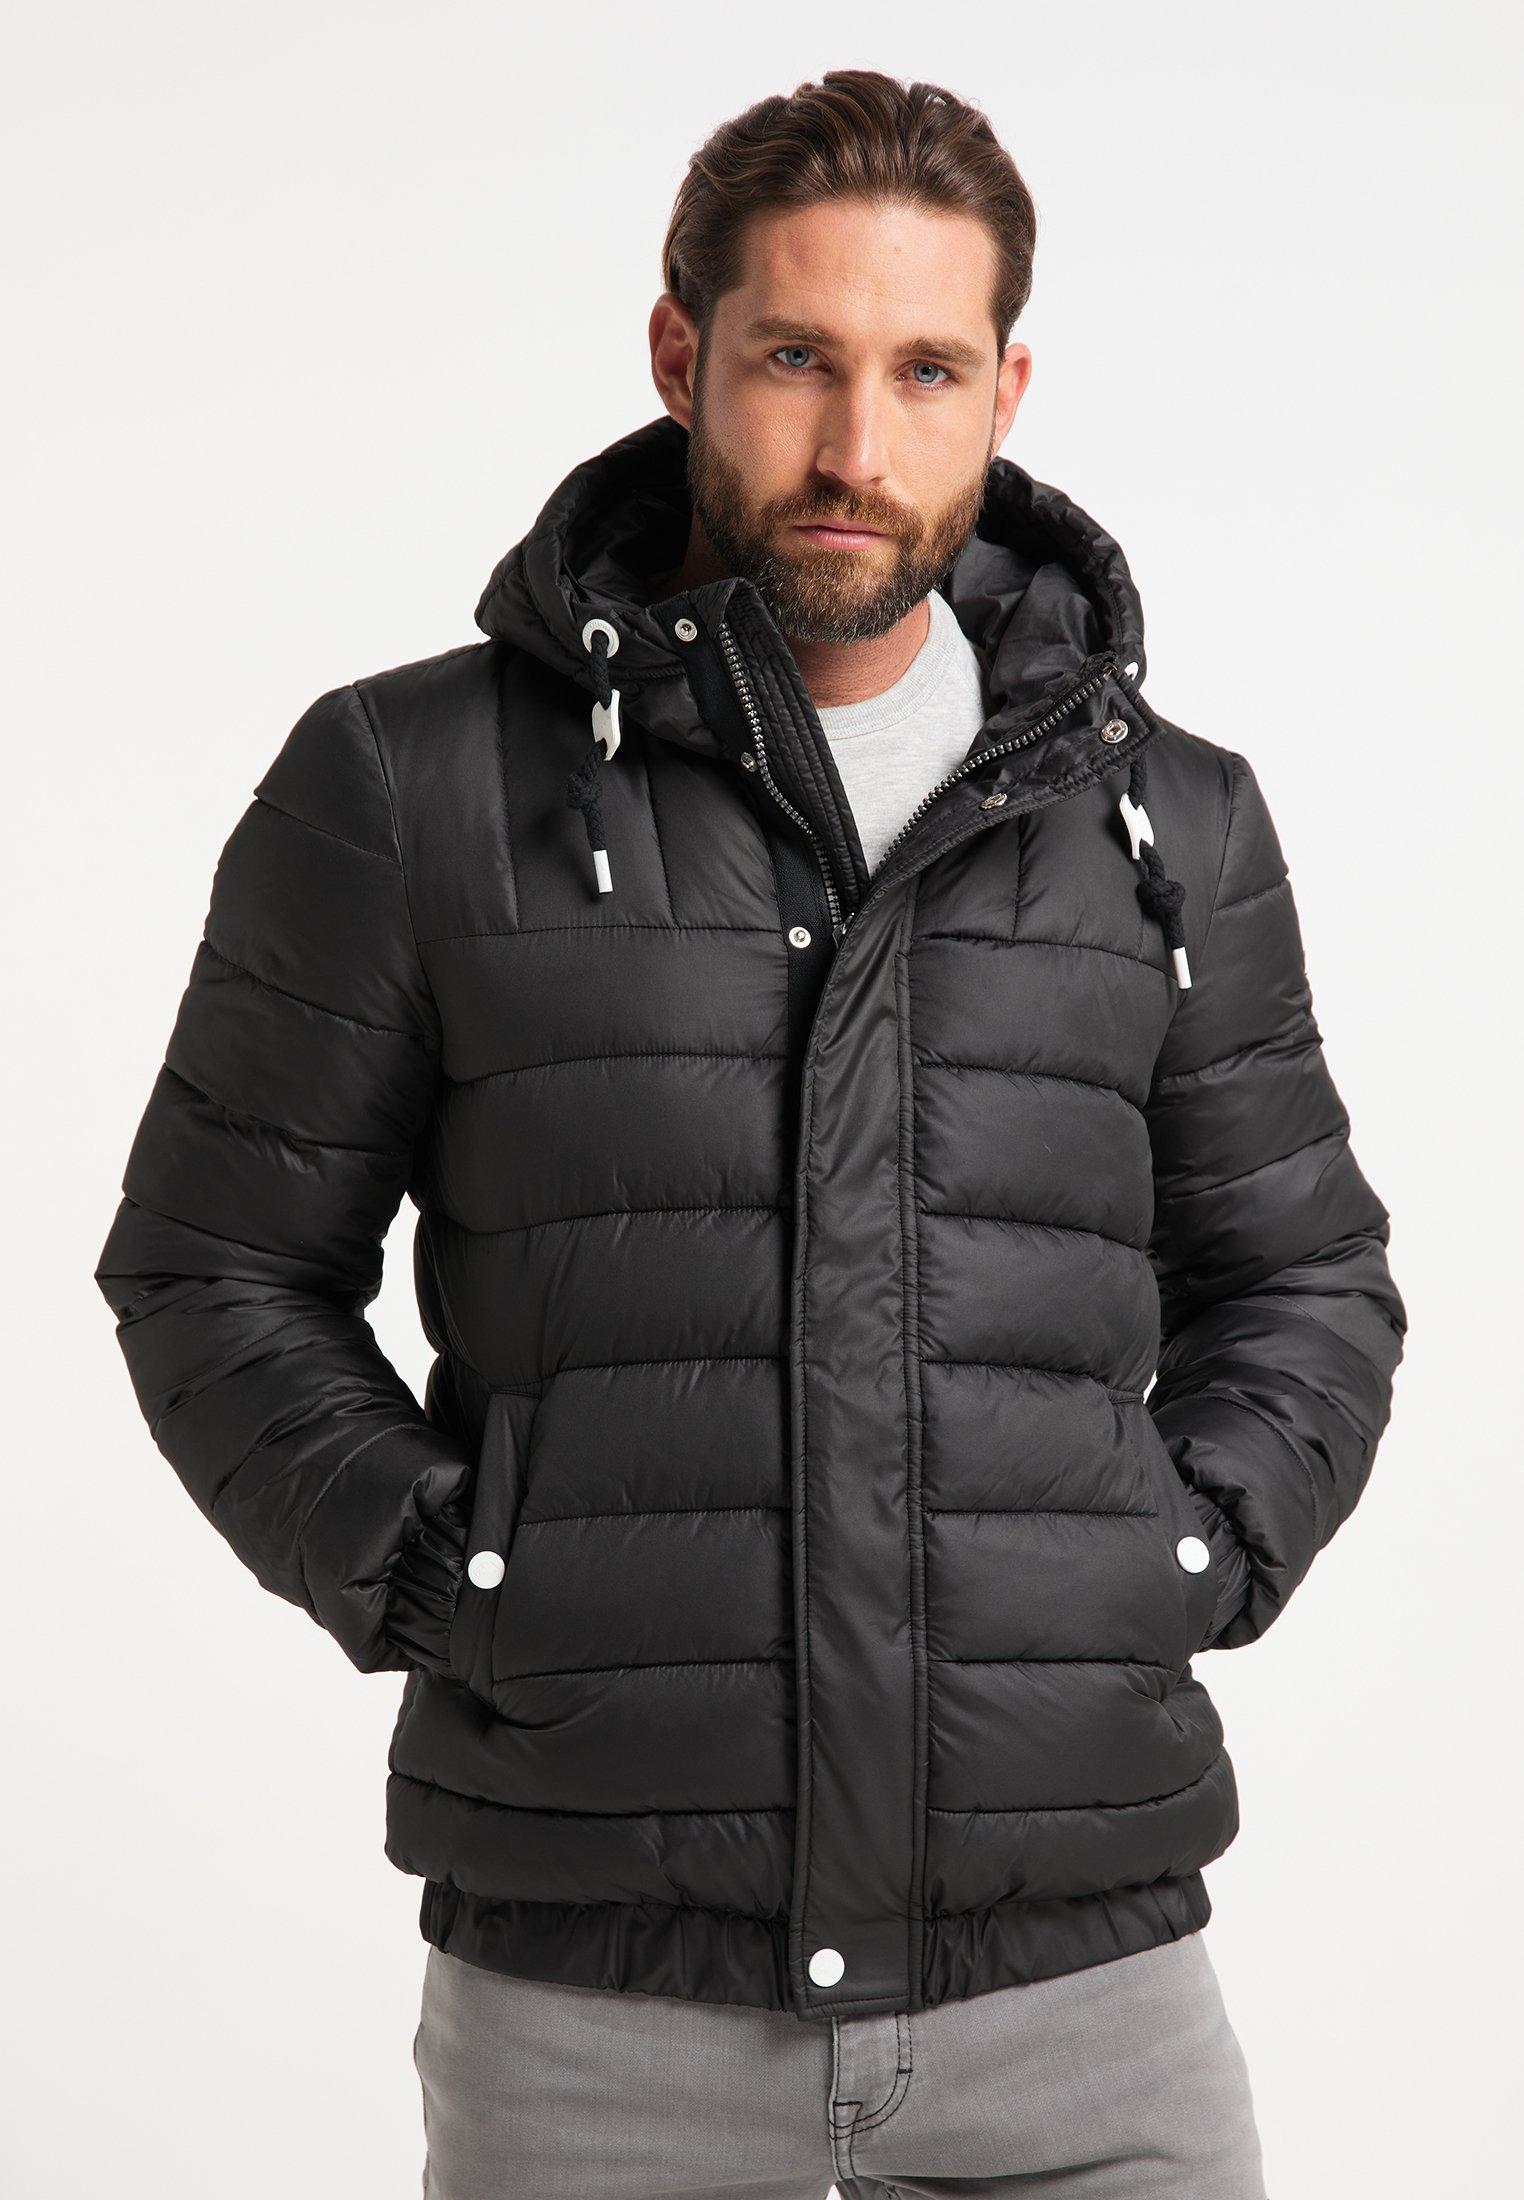 Homme GESTEPPTE - Veste d'hiver